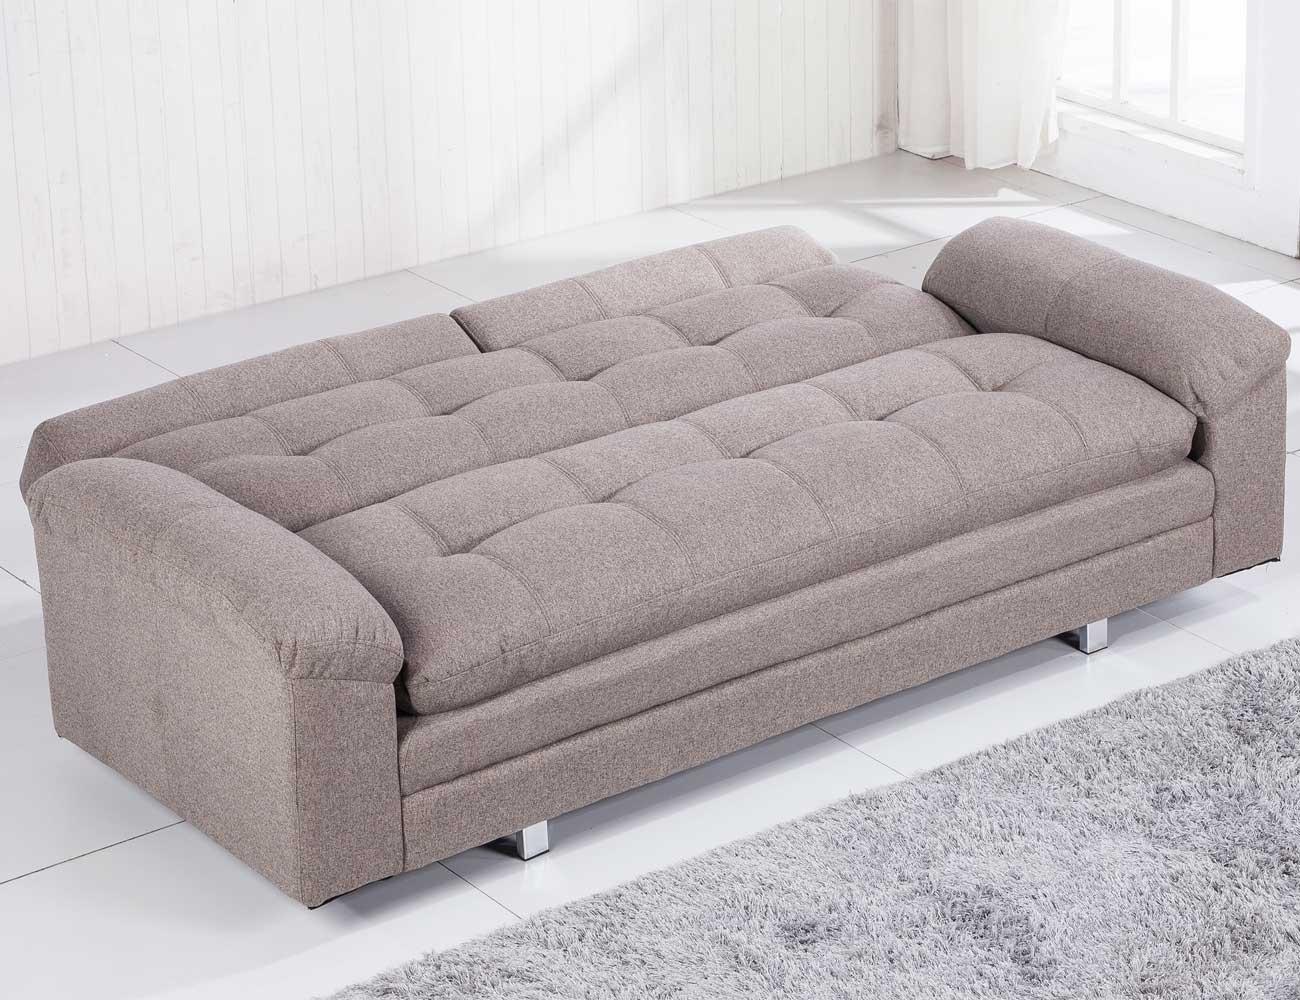 Sofa cama chaiselongue elegance moka 3